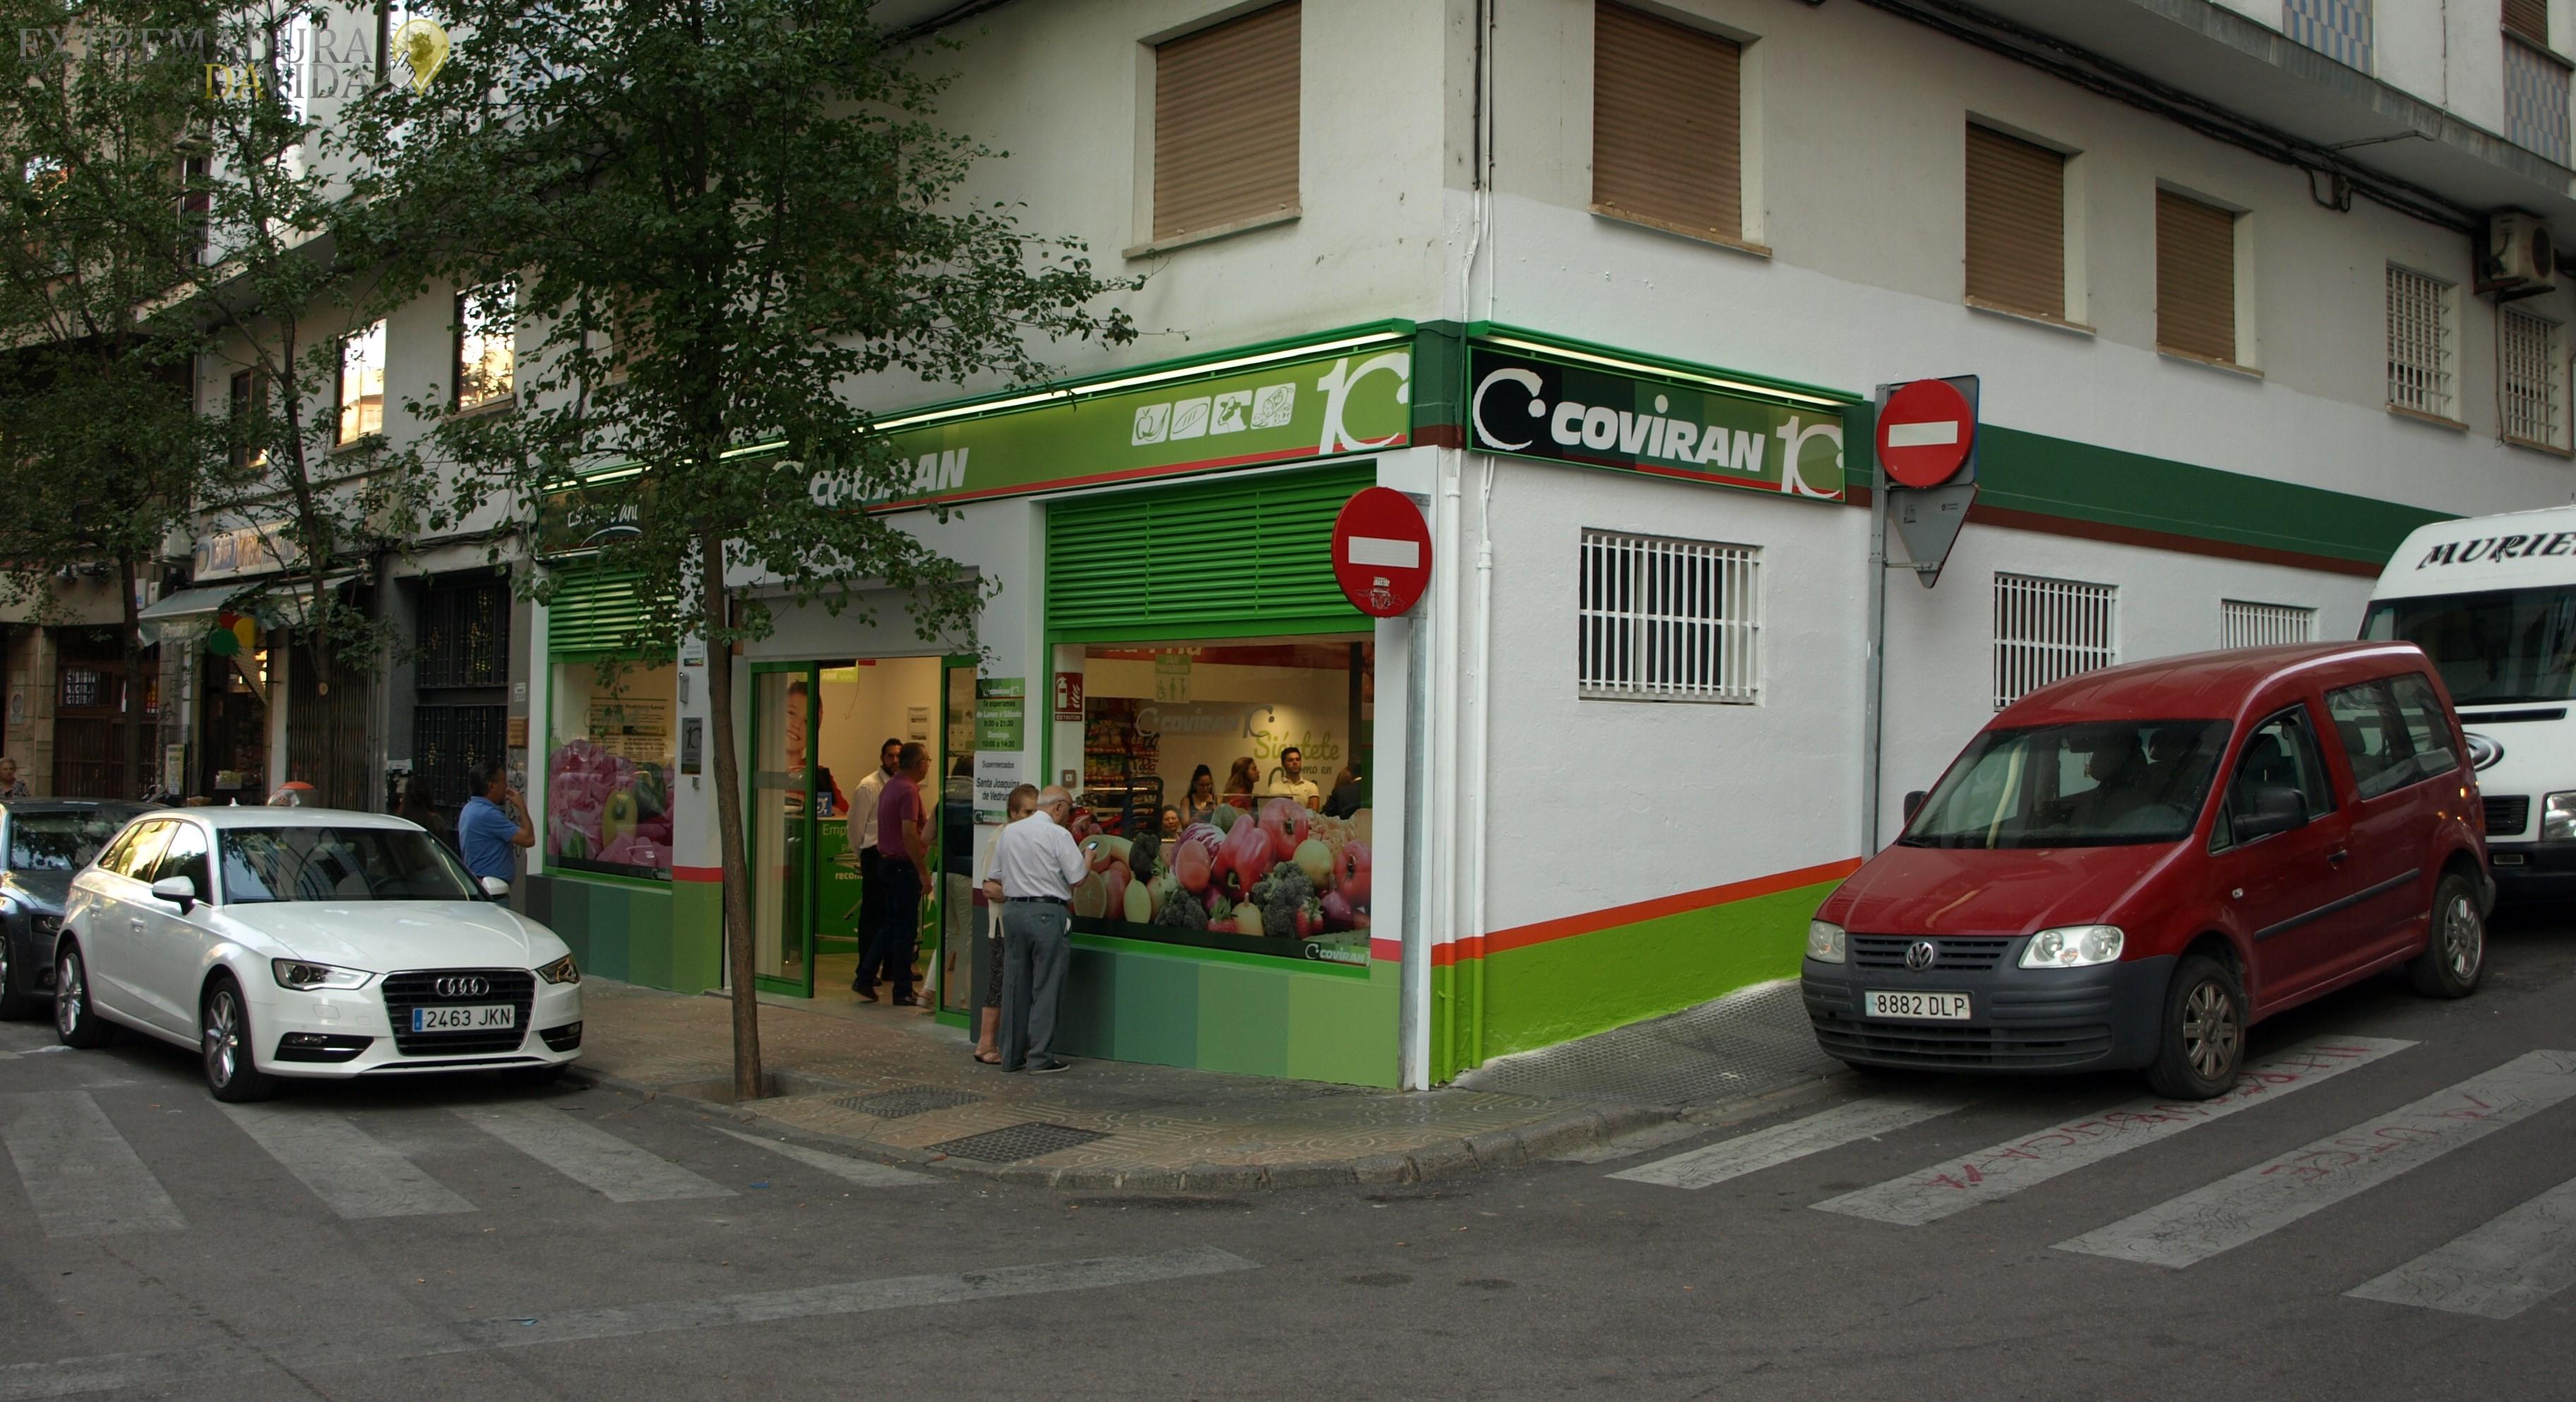 Supermercado productos extremeños en Cáceres Coviran